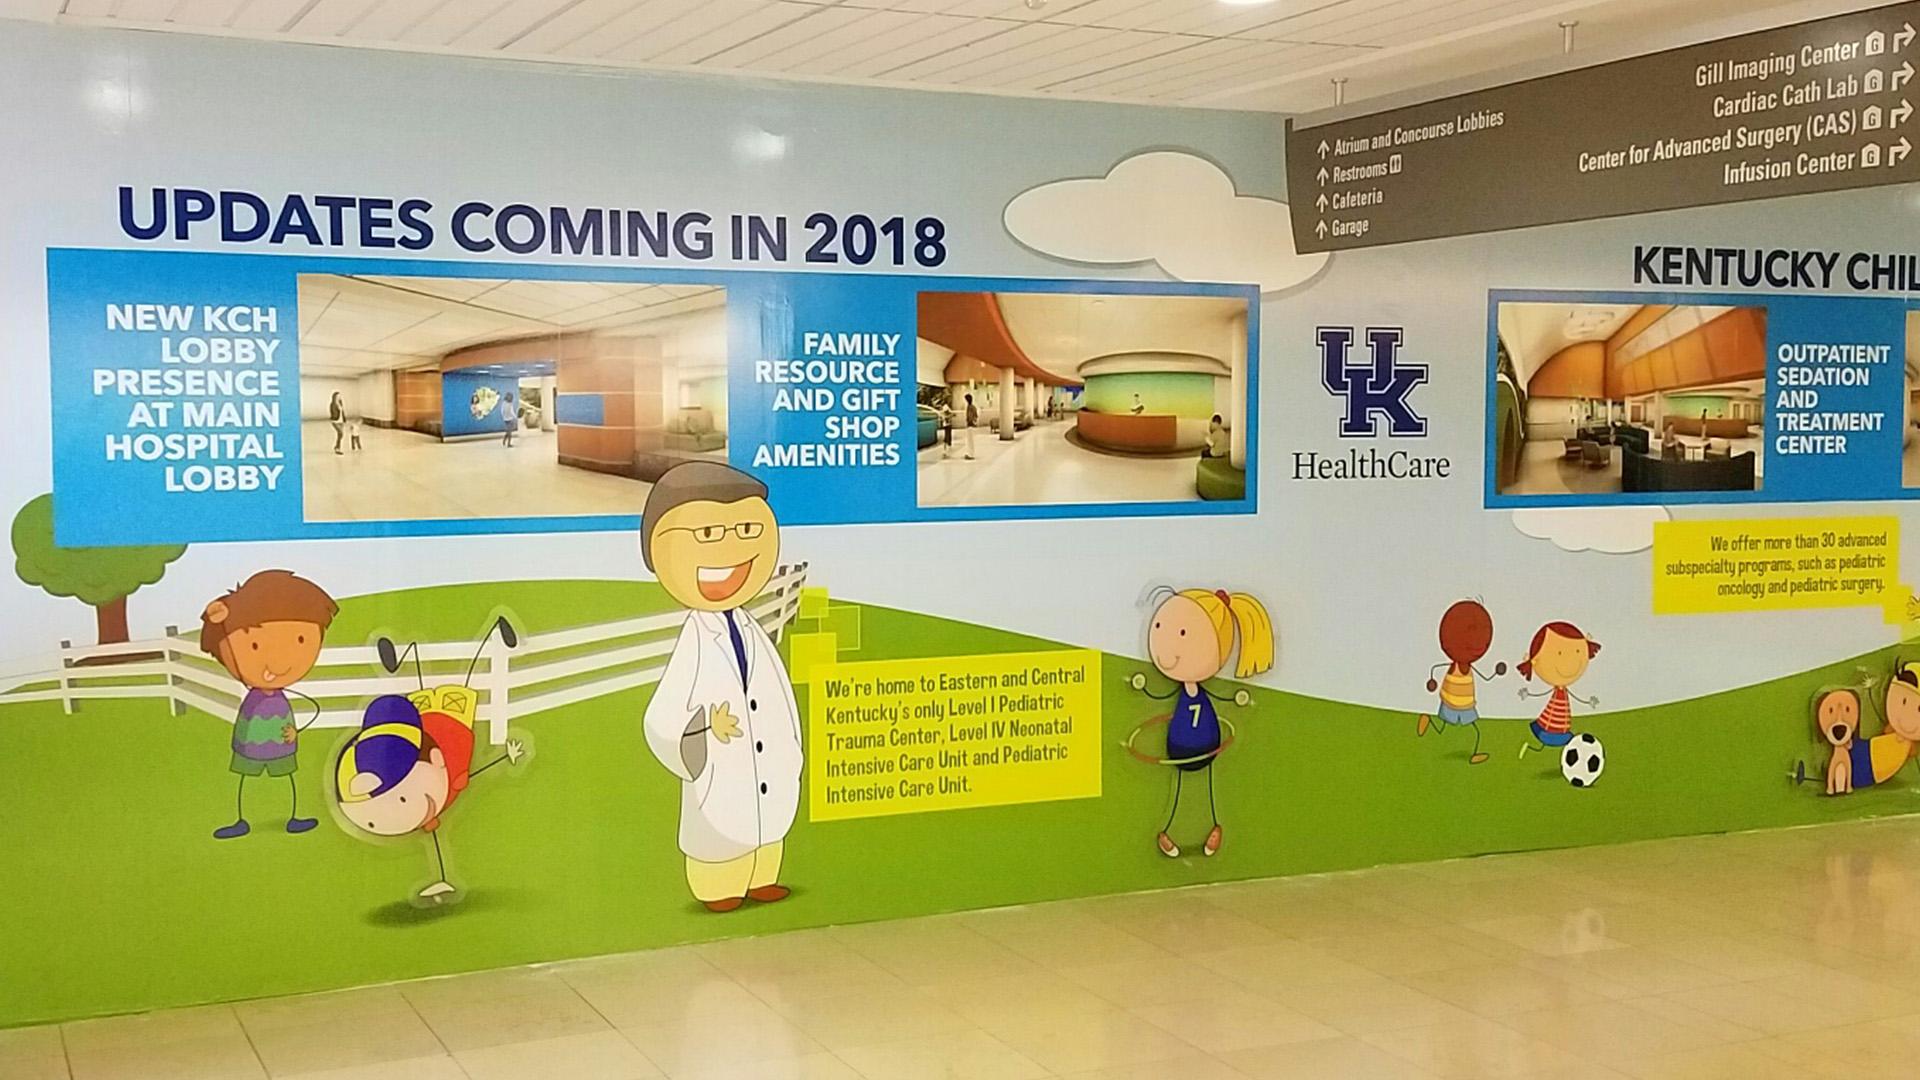 UK Children's Hospital Wall Graphic